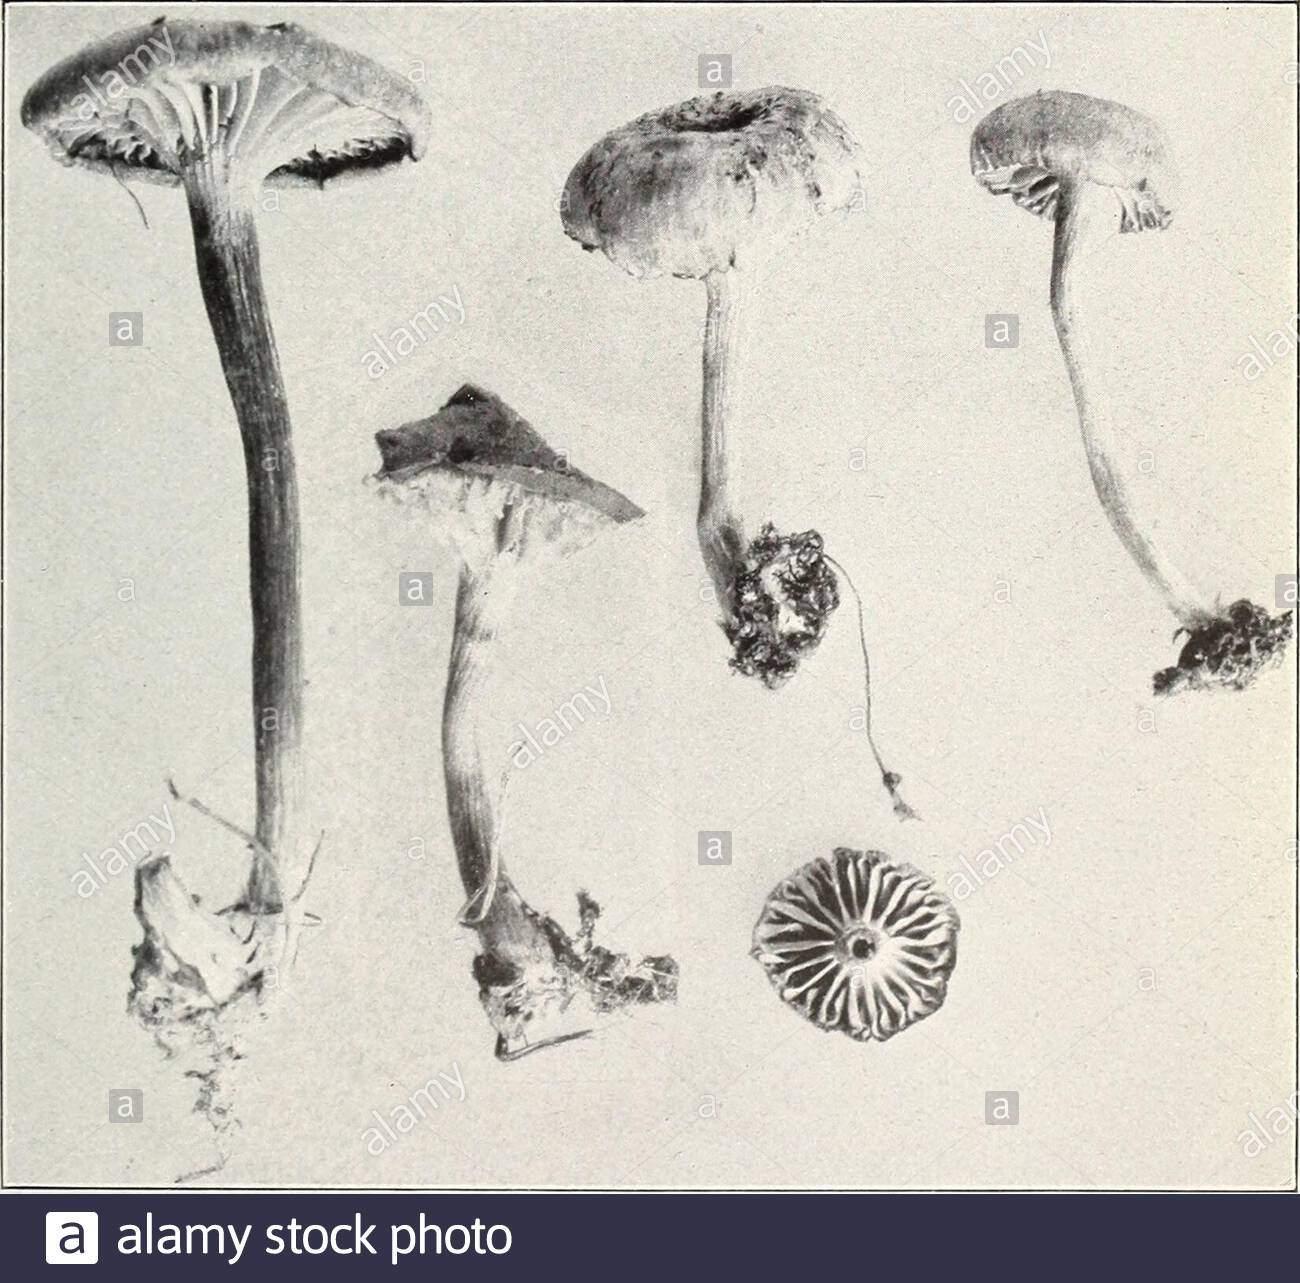 pilze und andere gemeinsame pilze abb 2 cantharellus cibarius essbare bui 175 ult 5 abt der landwirtschaft platte xi w 0 ich l 1 jp1 4 l l jpj k ifcj fcv 4 jh abb 1 clitocybe multiceps essbare abb 2 clitocybe laccata essbar bui 1 75 us abt landwirtschaft platte xii t f v w v r ft vtt abb 1 omphalia campanella essbare 2anejgj